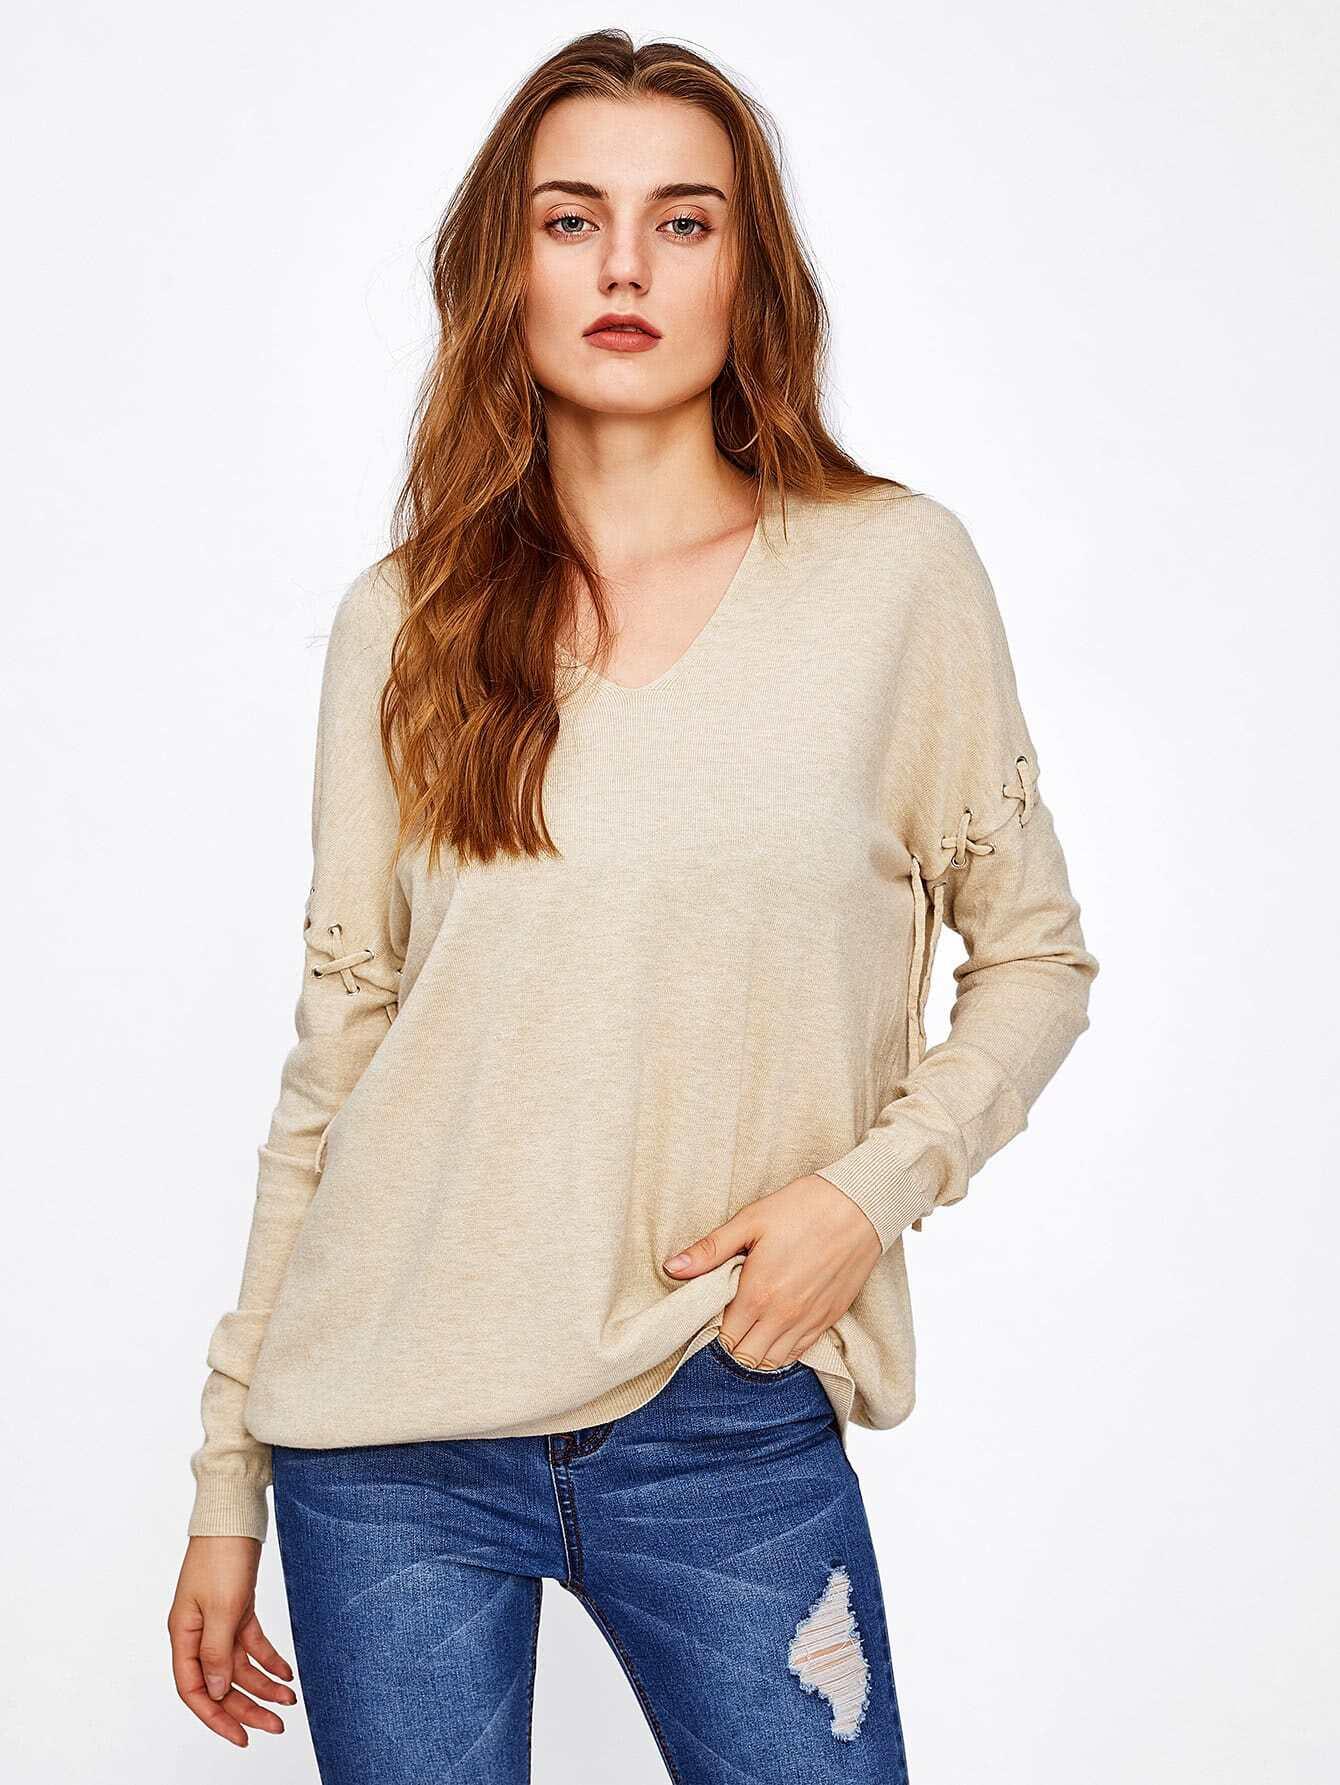 Eyelet Lace Up Sleeve Knitwear sweater170713401